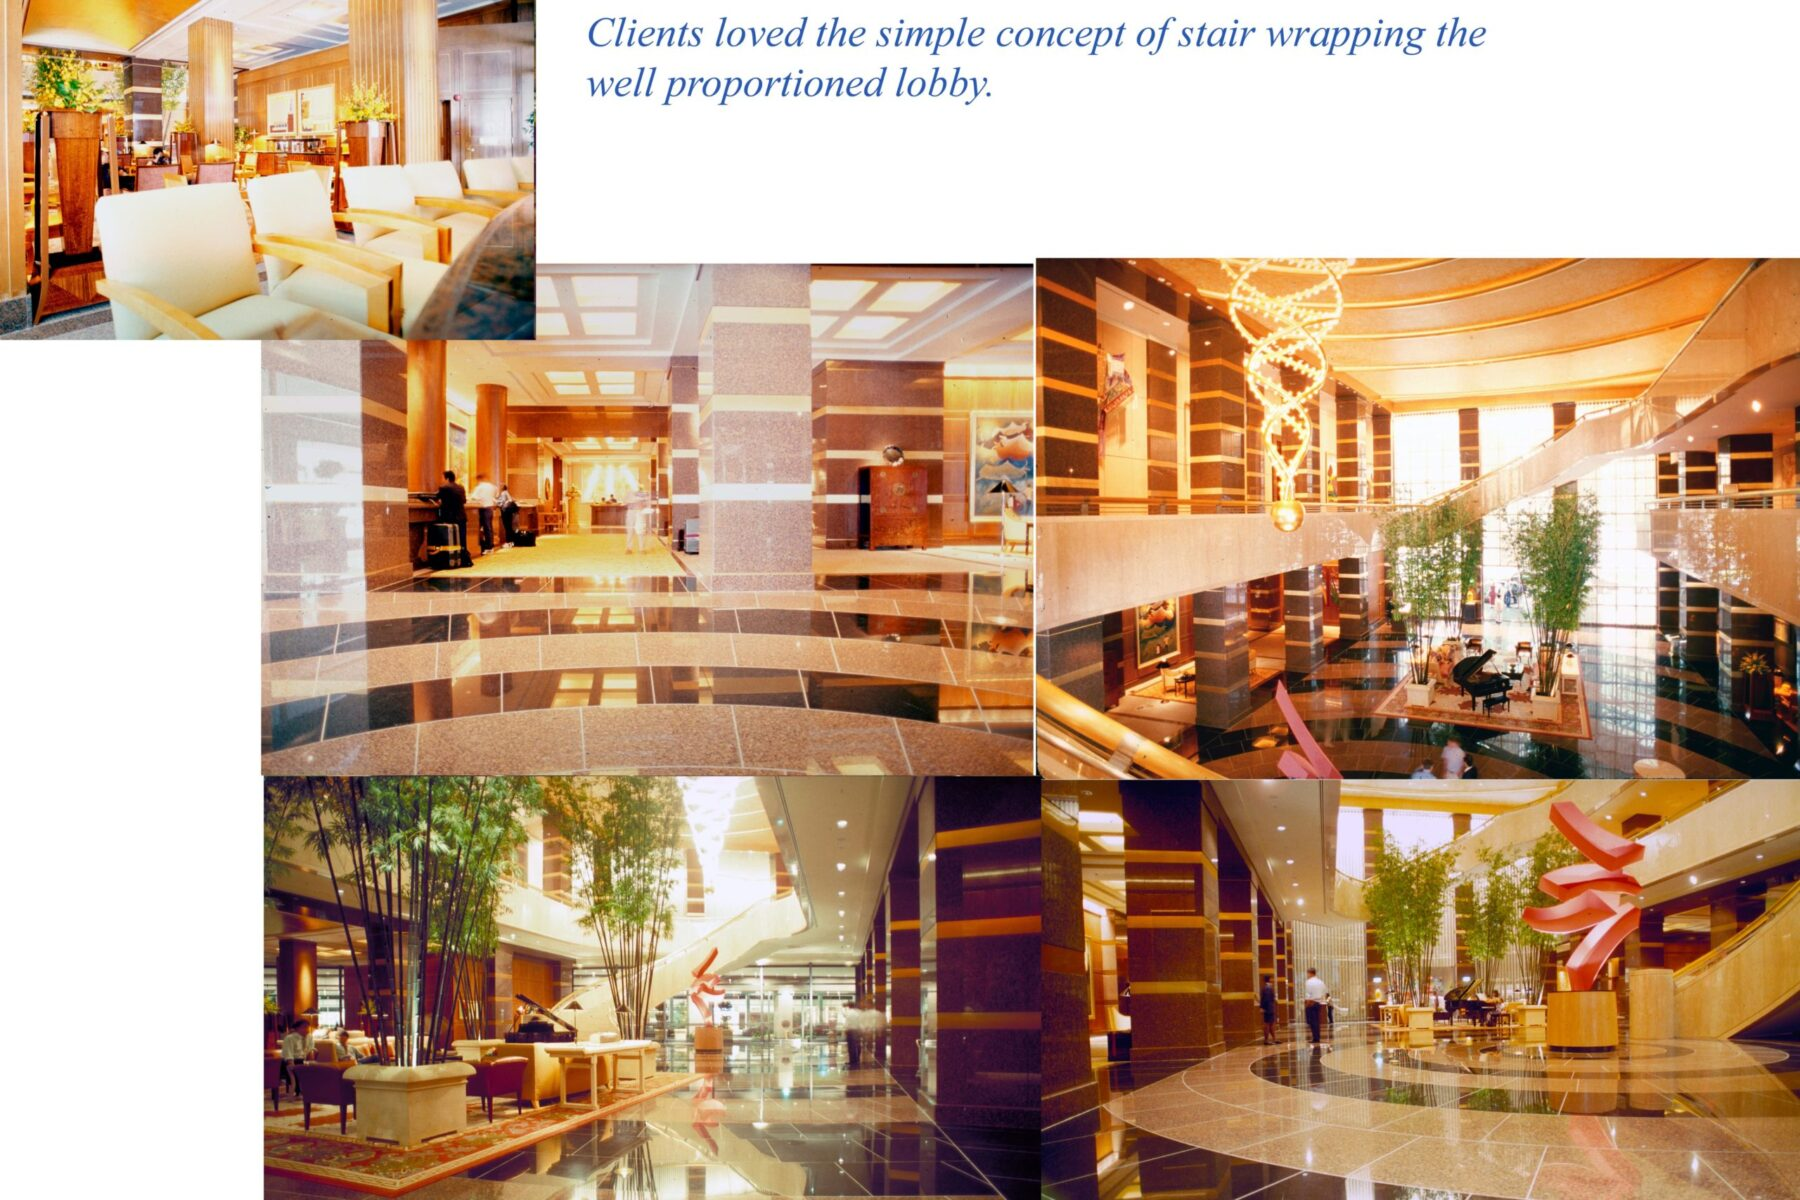 46.-Conrad-Int-Hotel-Millenia-Walk-Int-views-Copy-scaled